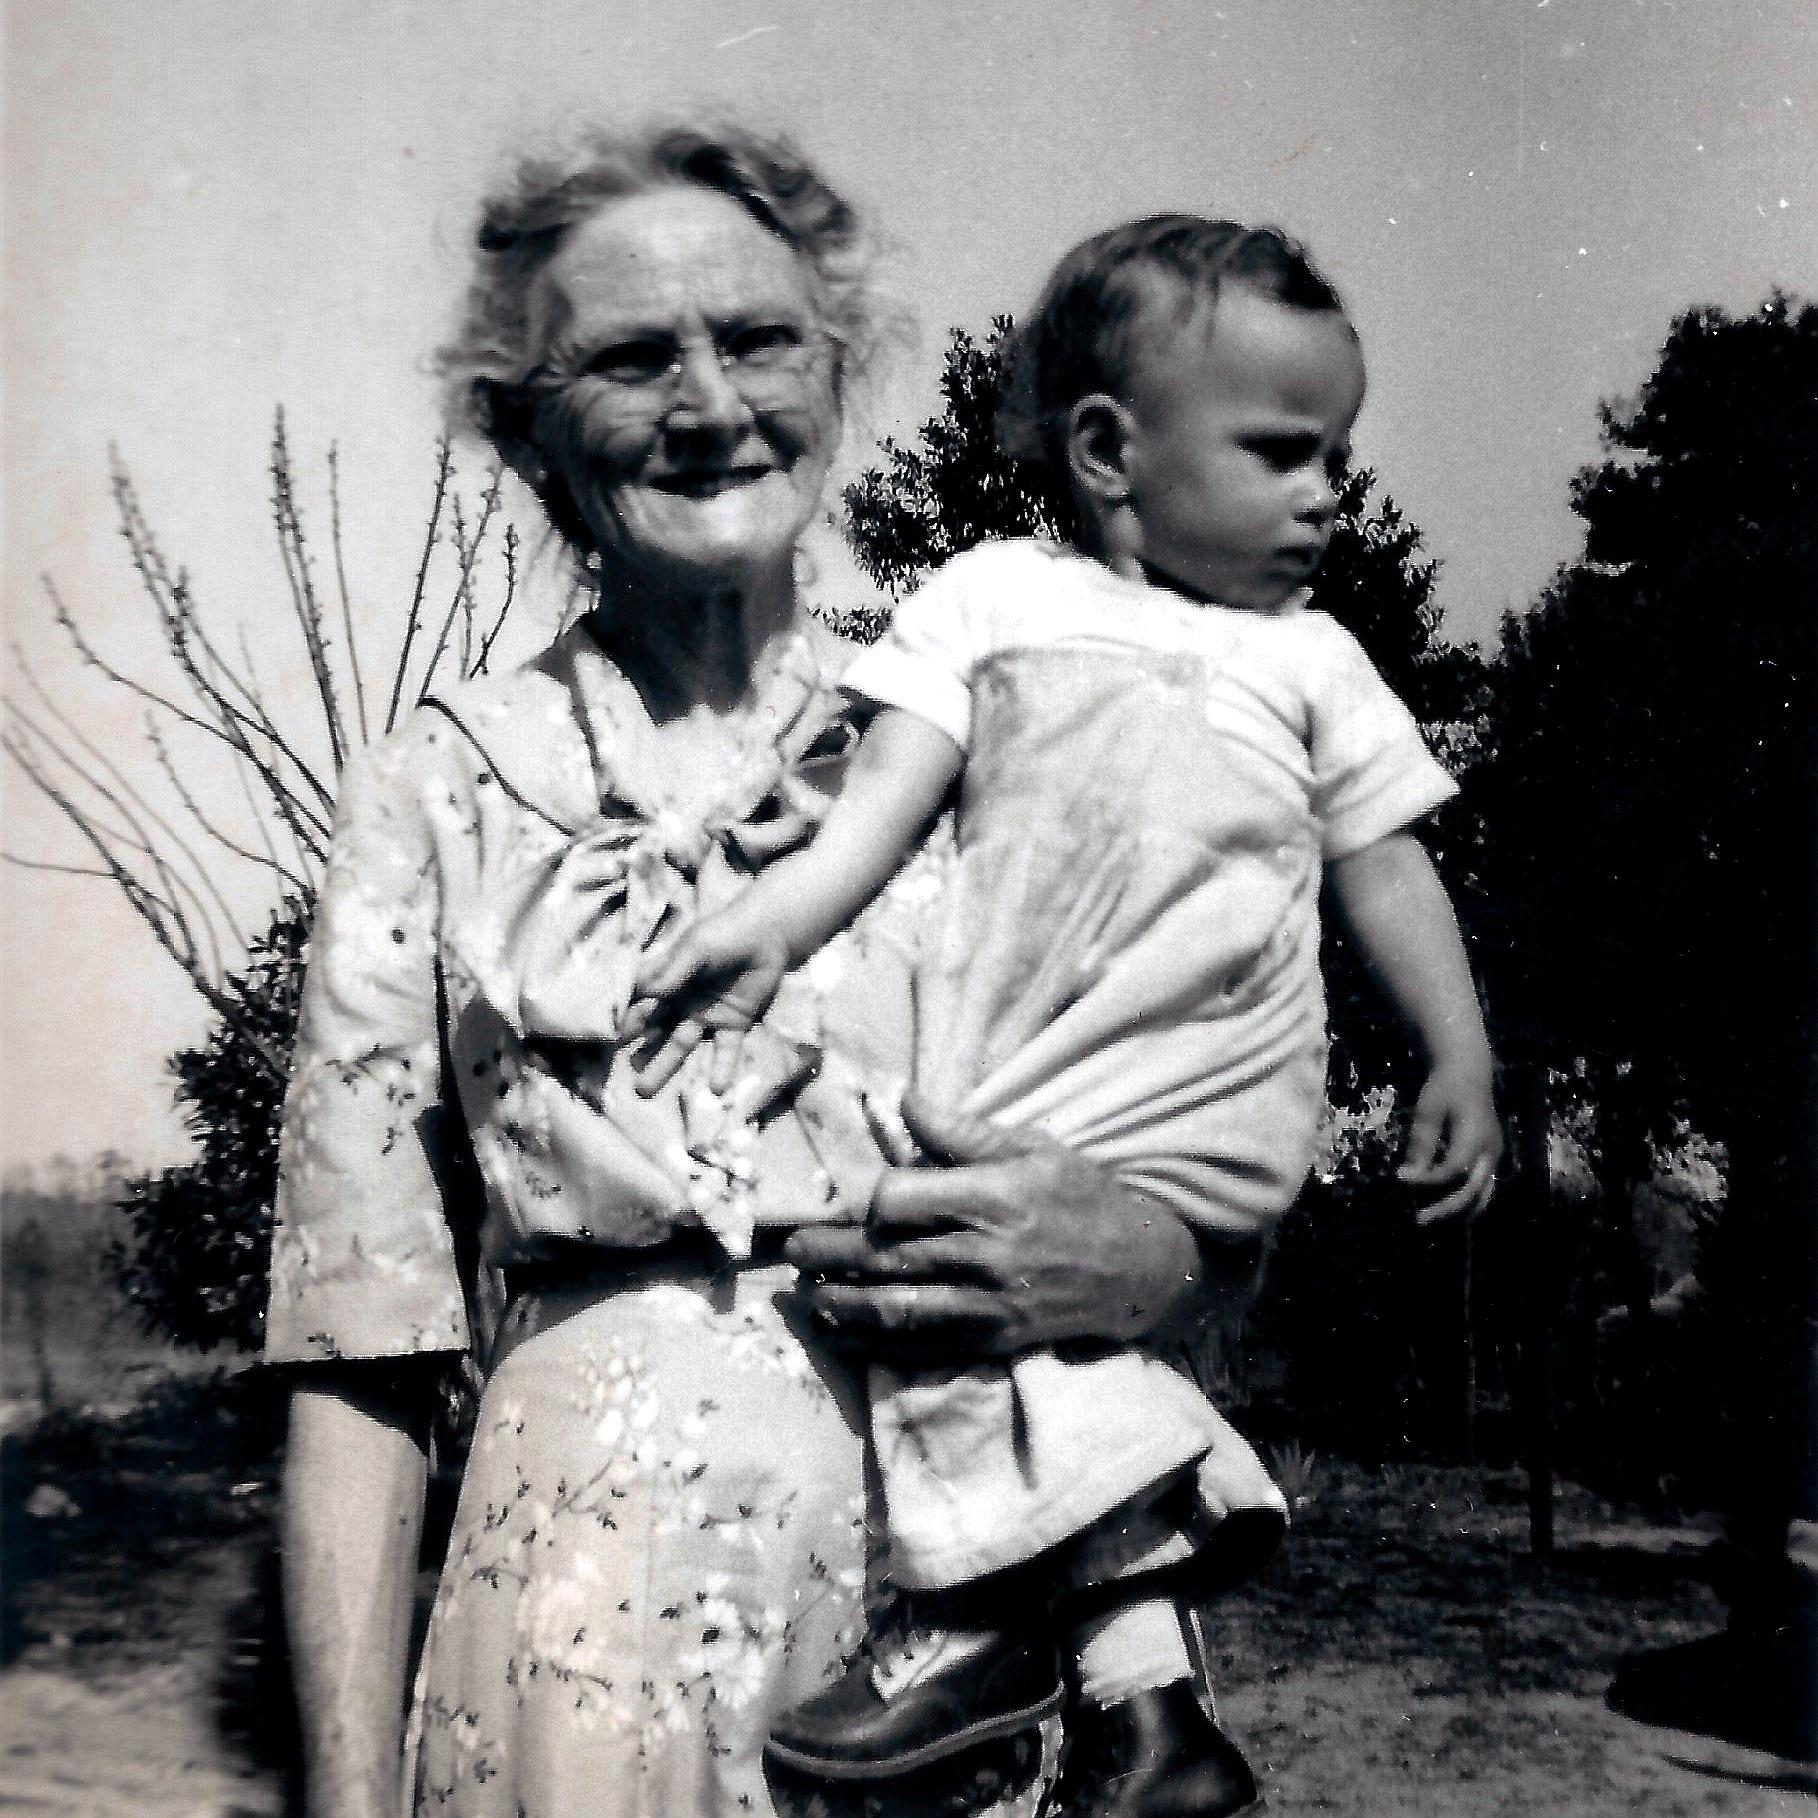 Julia Belle Young Sinclair 1881-1974